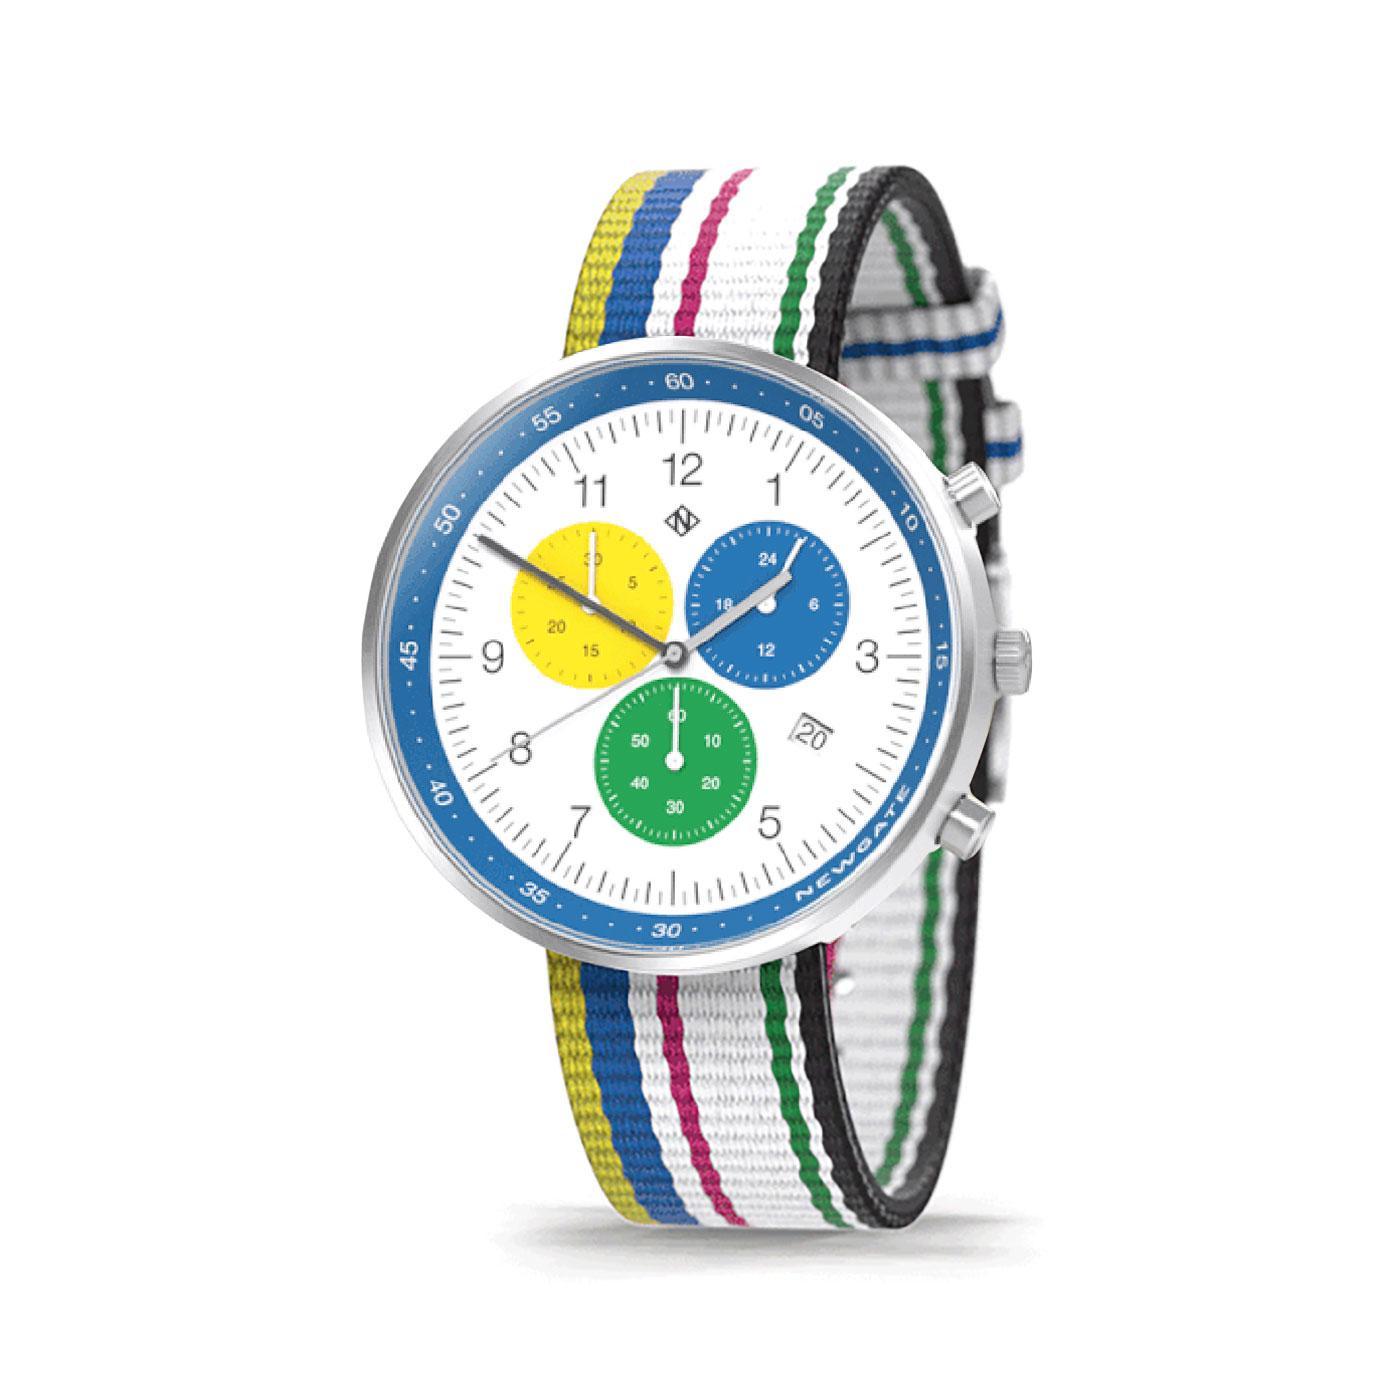 G6 Oxford NEWGATE CLOCKS Chronograph Watch